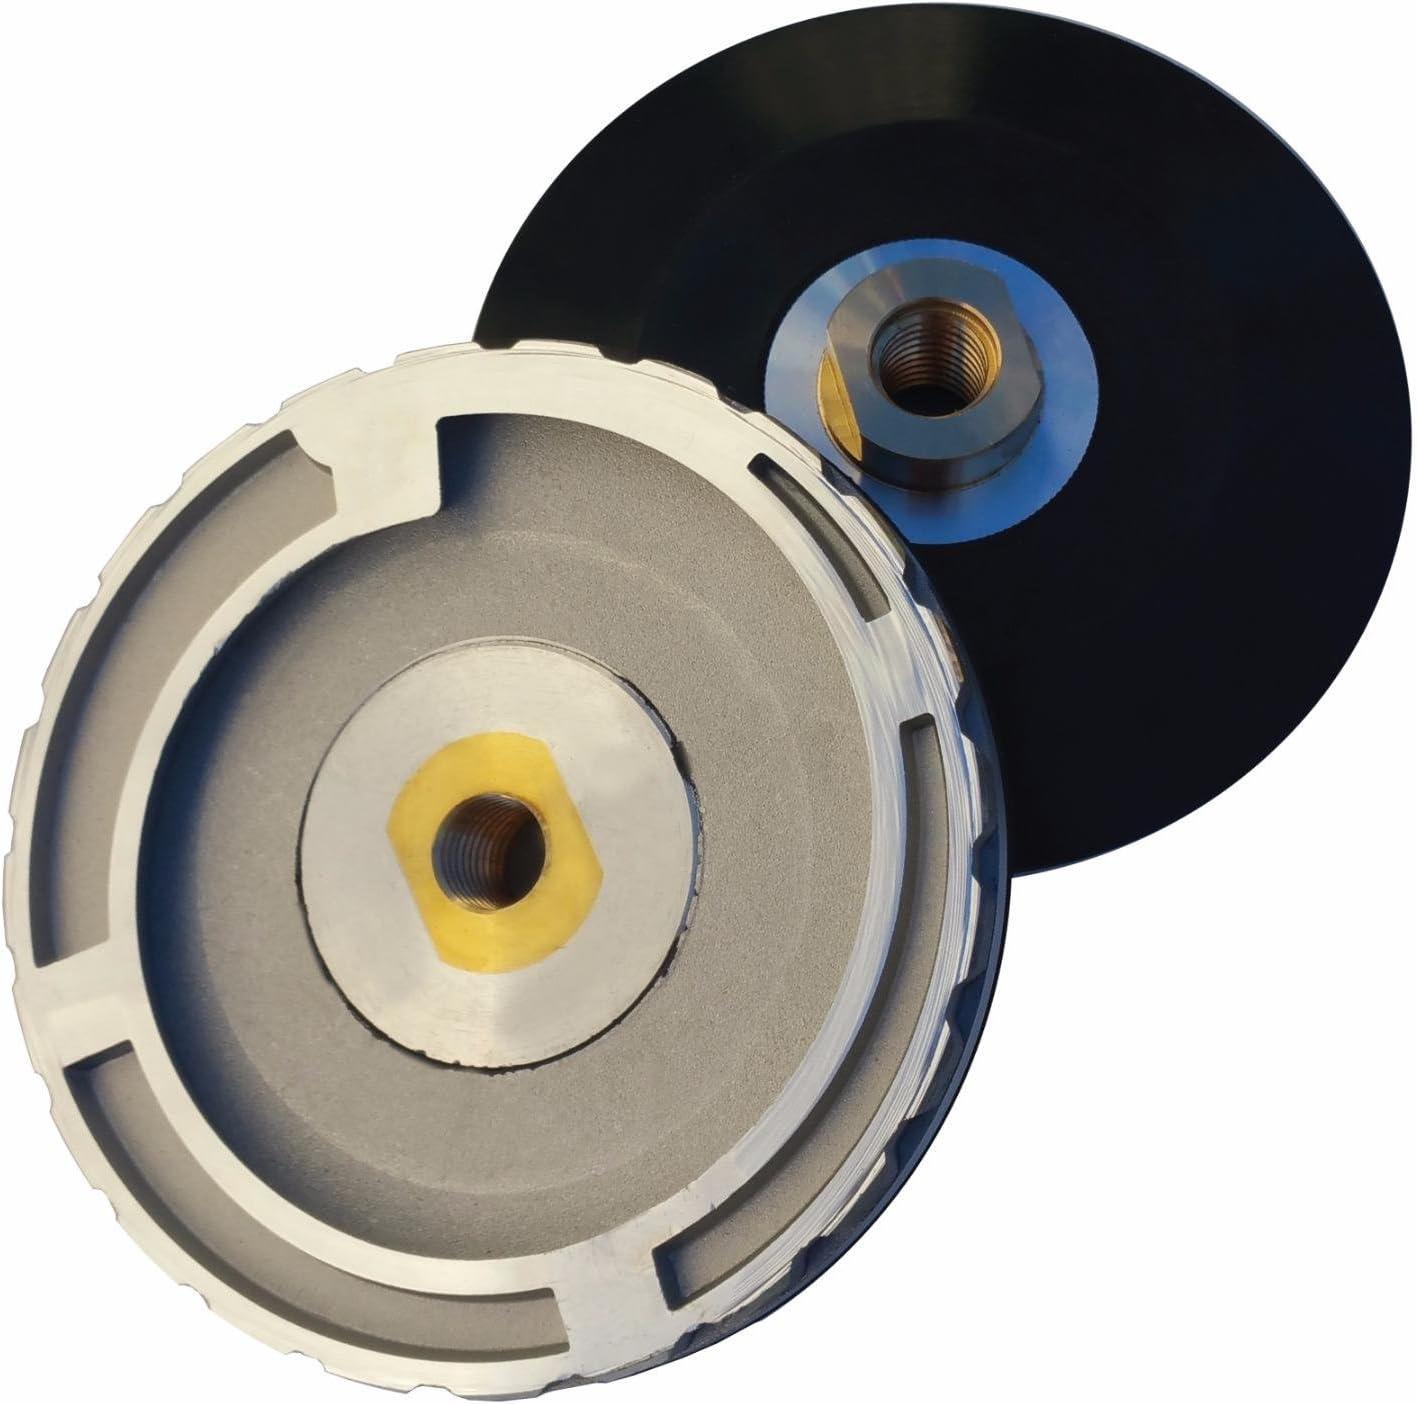 Stadea RBP101P Rubber Backing Pad Extra Flexible Backer Pad for Edges Arbor 5//8 11 Shop N Save Diamond Tools Arbor 5//8 11 Tight Corner Polishing Tight Corner Polishing